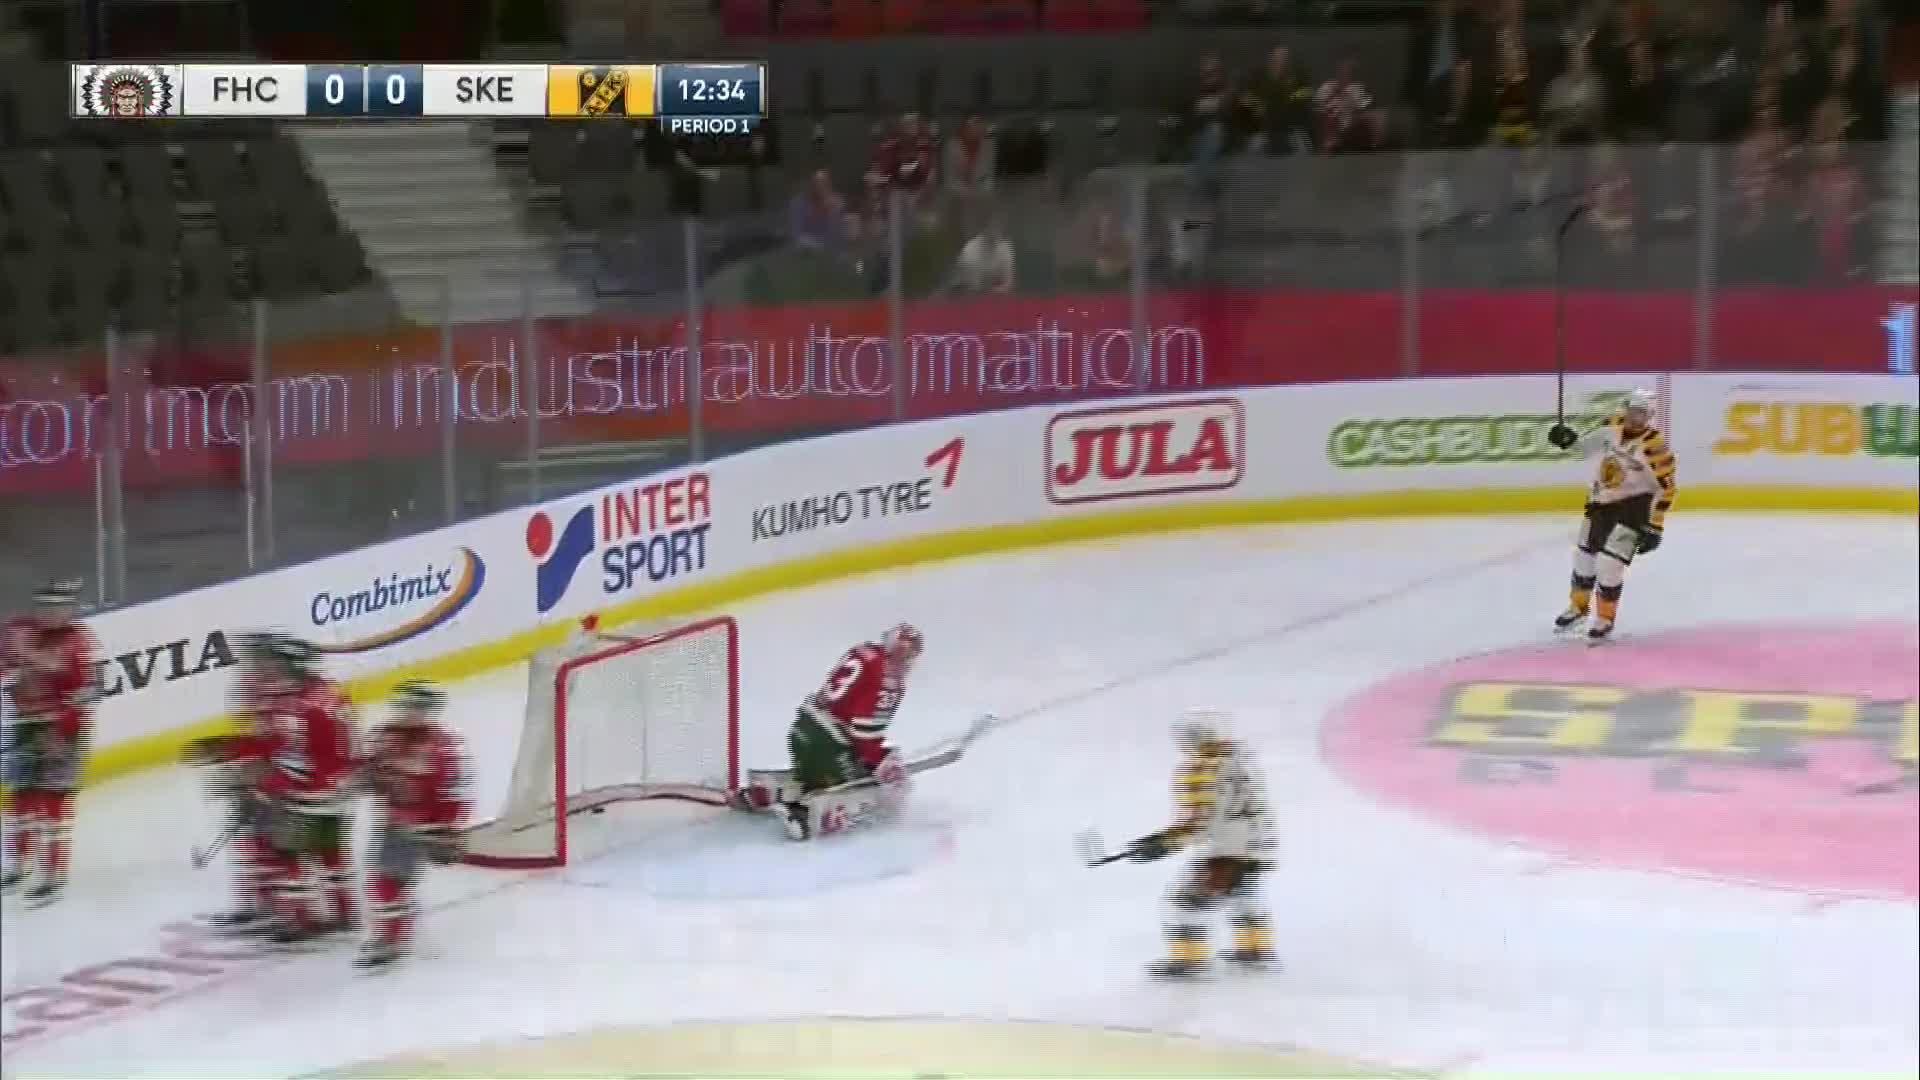 Frölunda HC - Skellefteå AIK 0-1